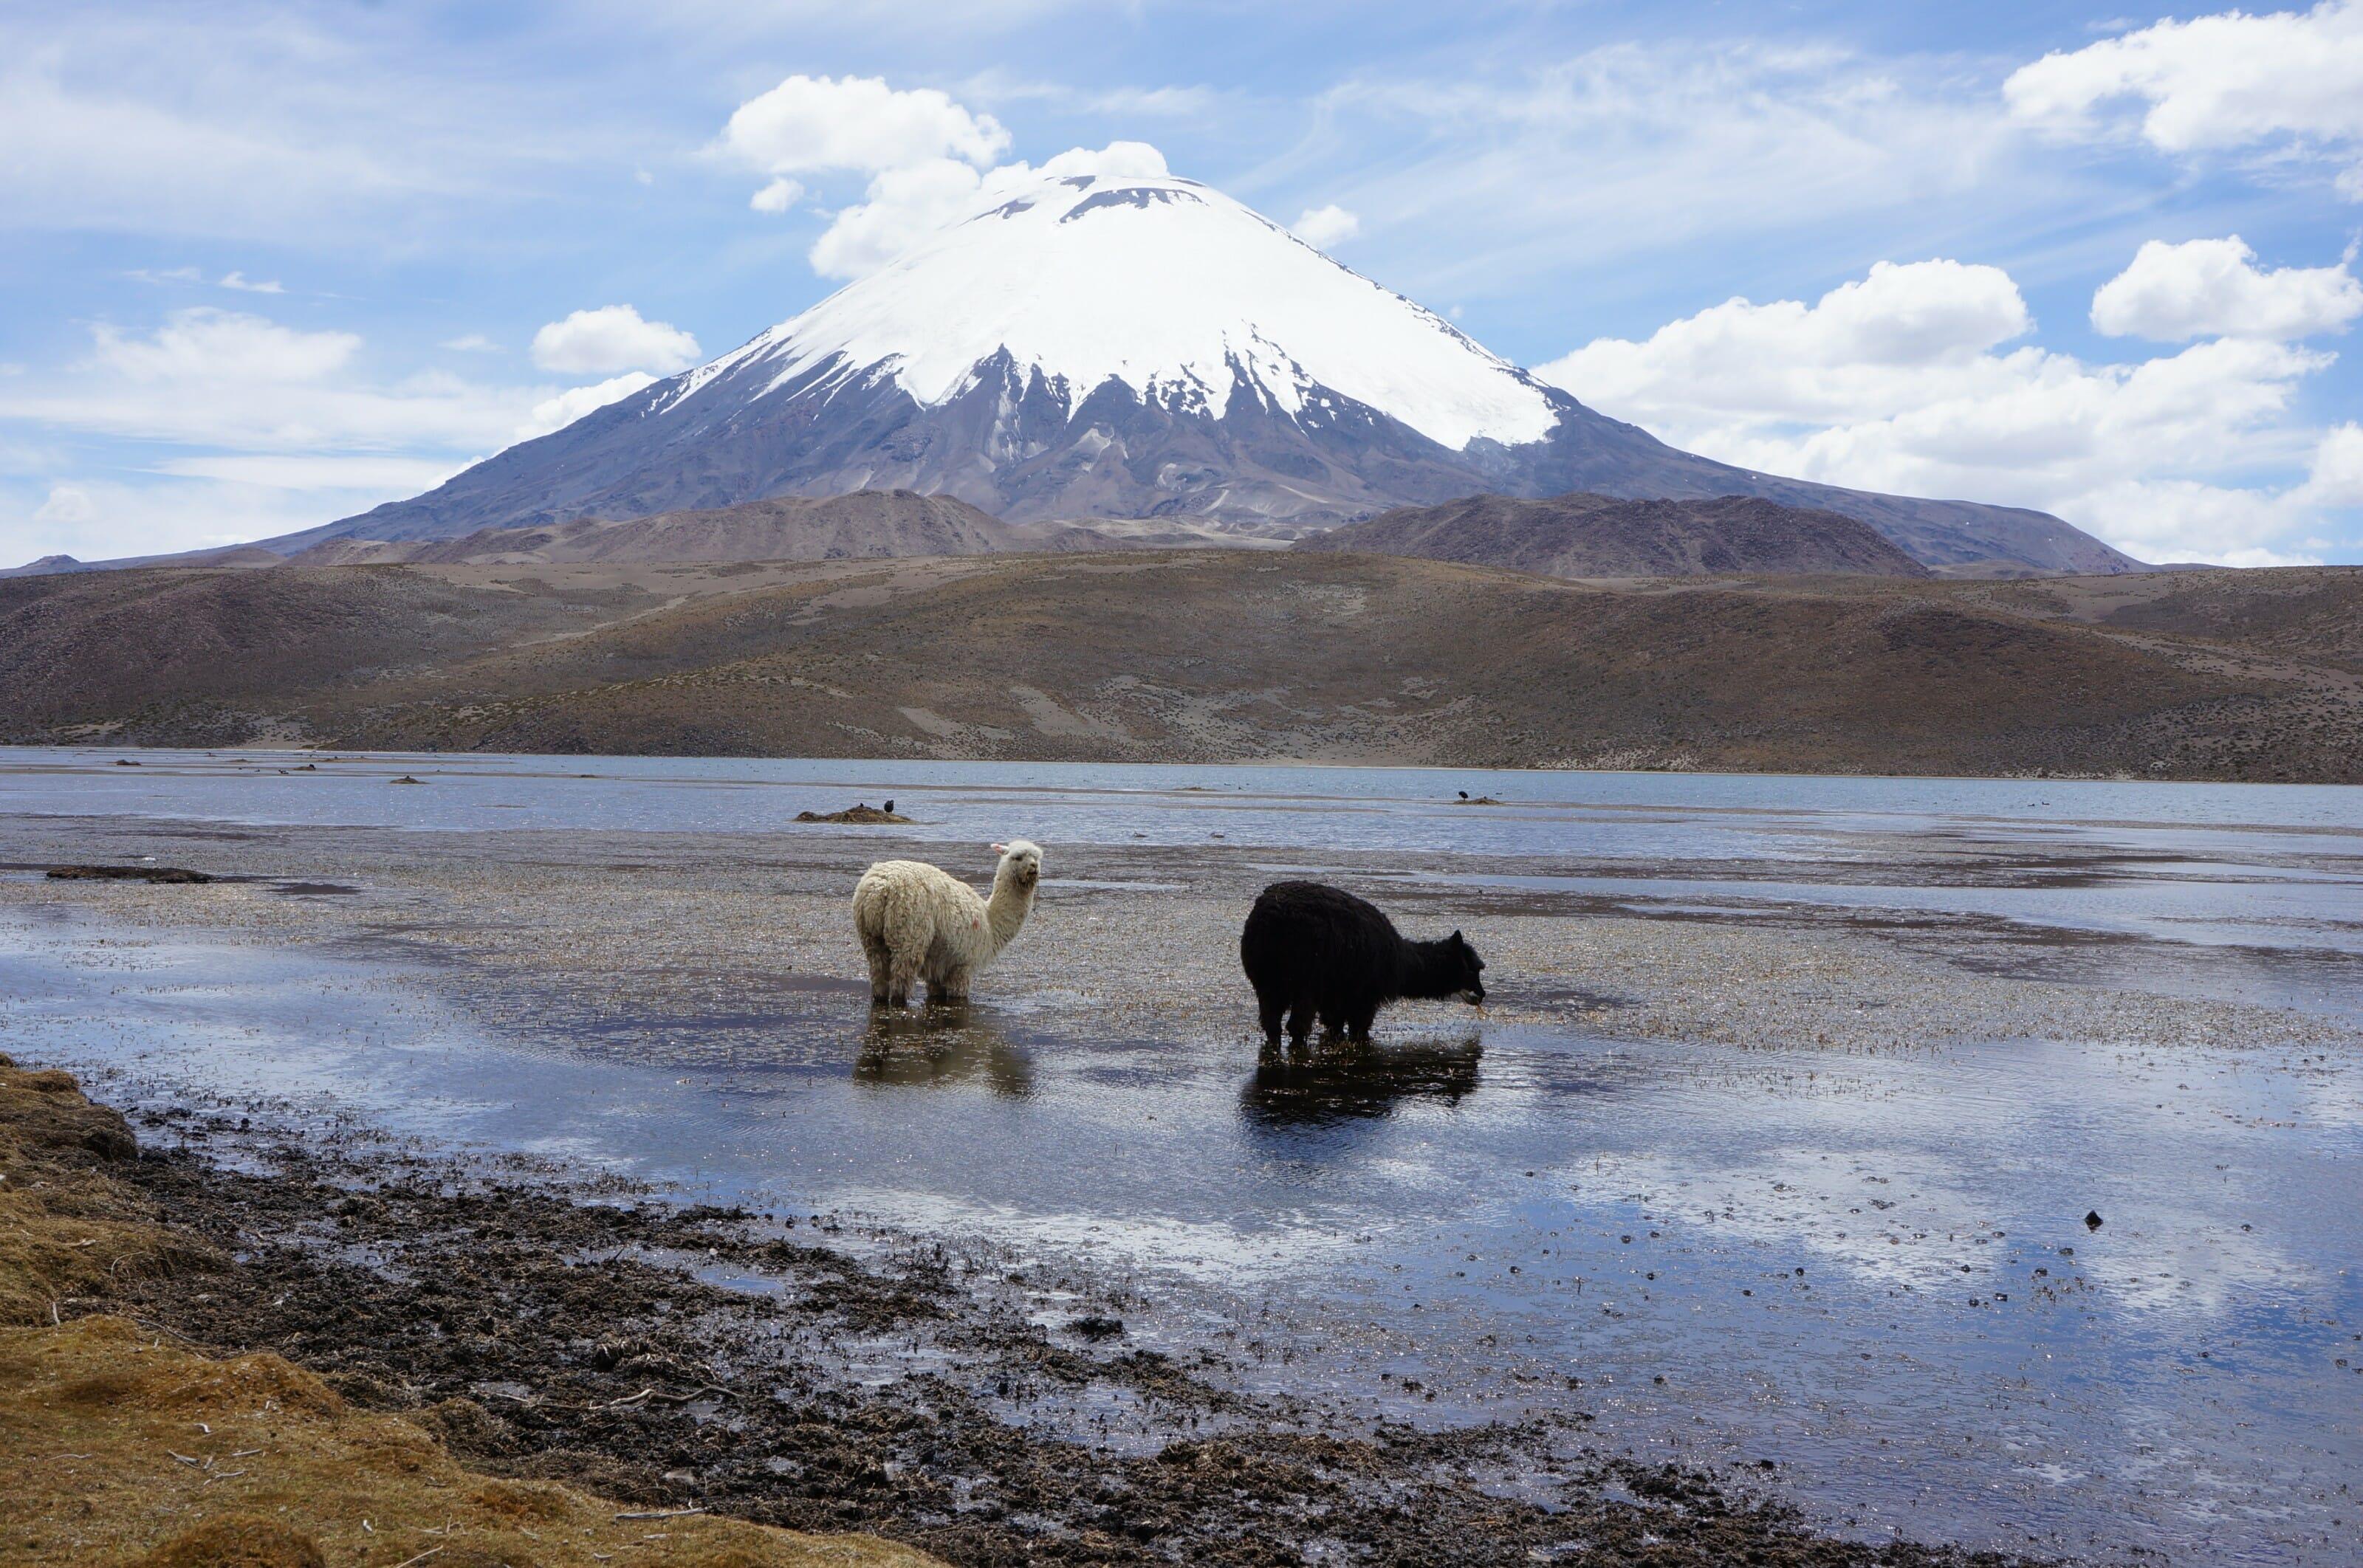 lama et volcan en bolivie